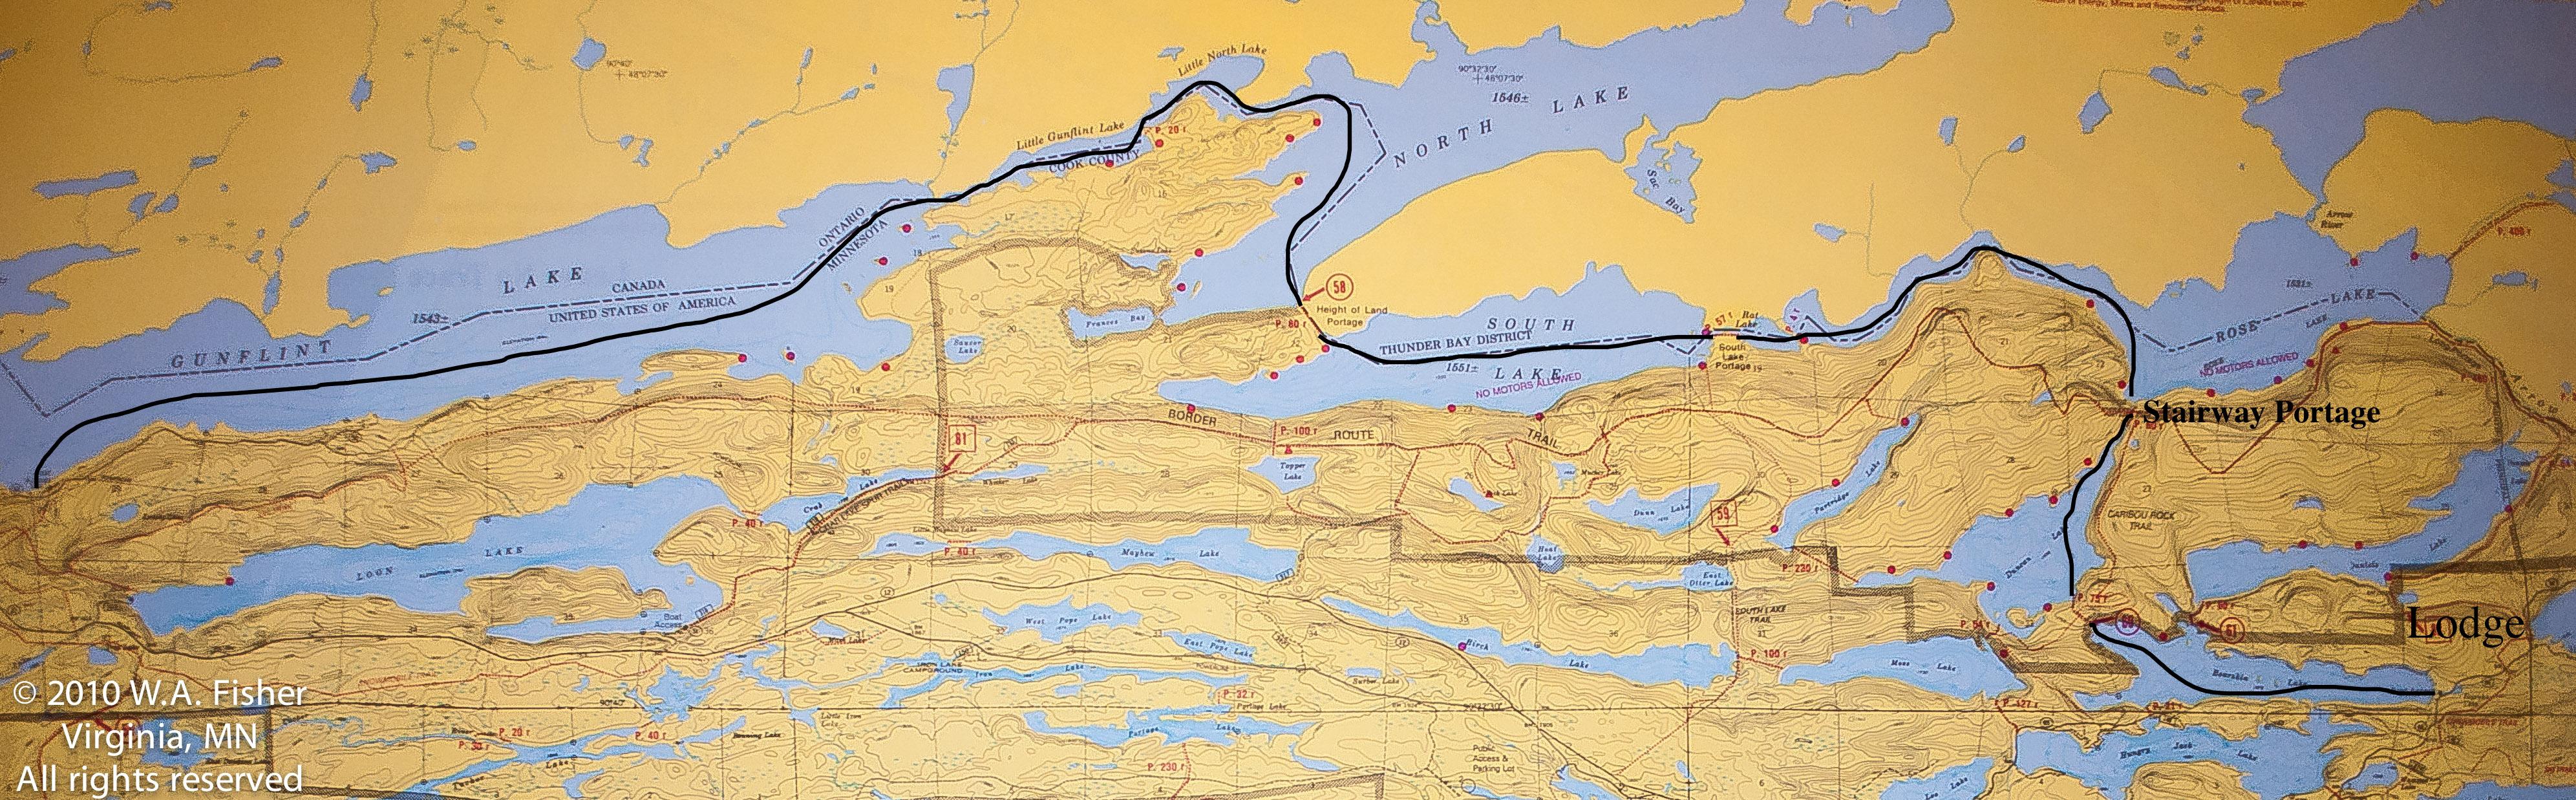 Maps-2